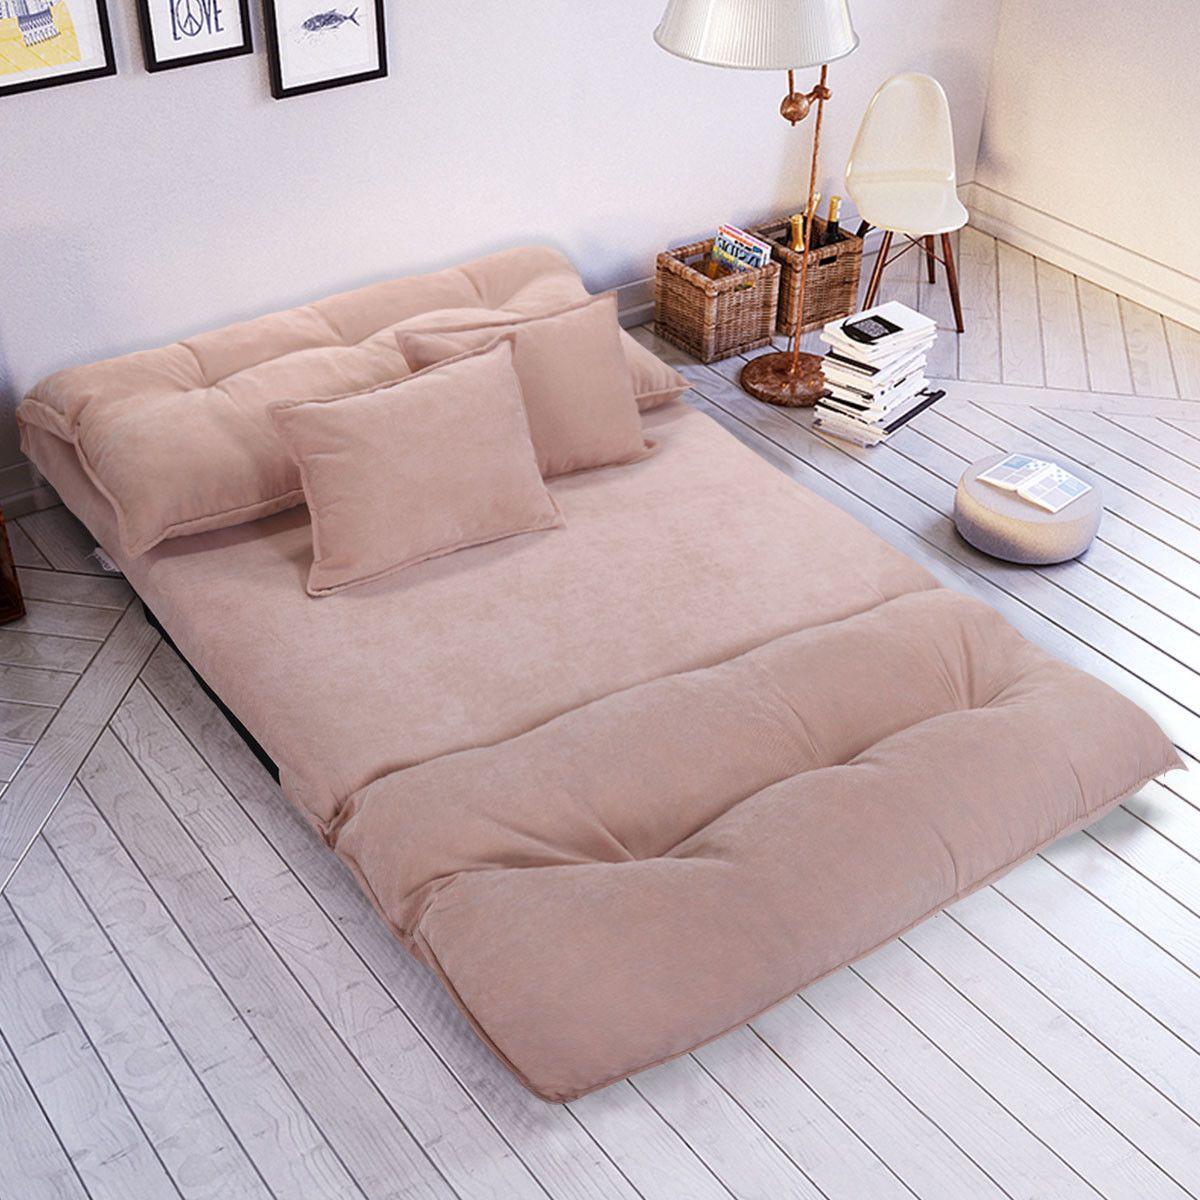 98 49 New Adjustable Floor Sofa Bed Lounge Sofa Bed Floor Couch